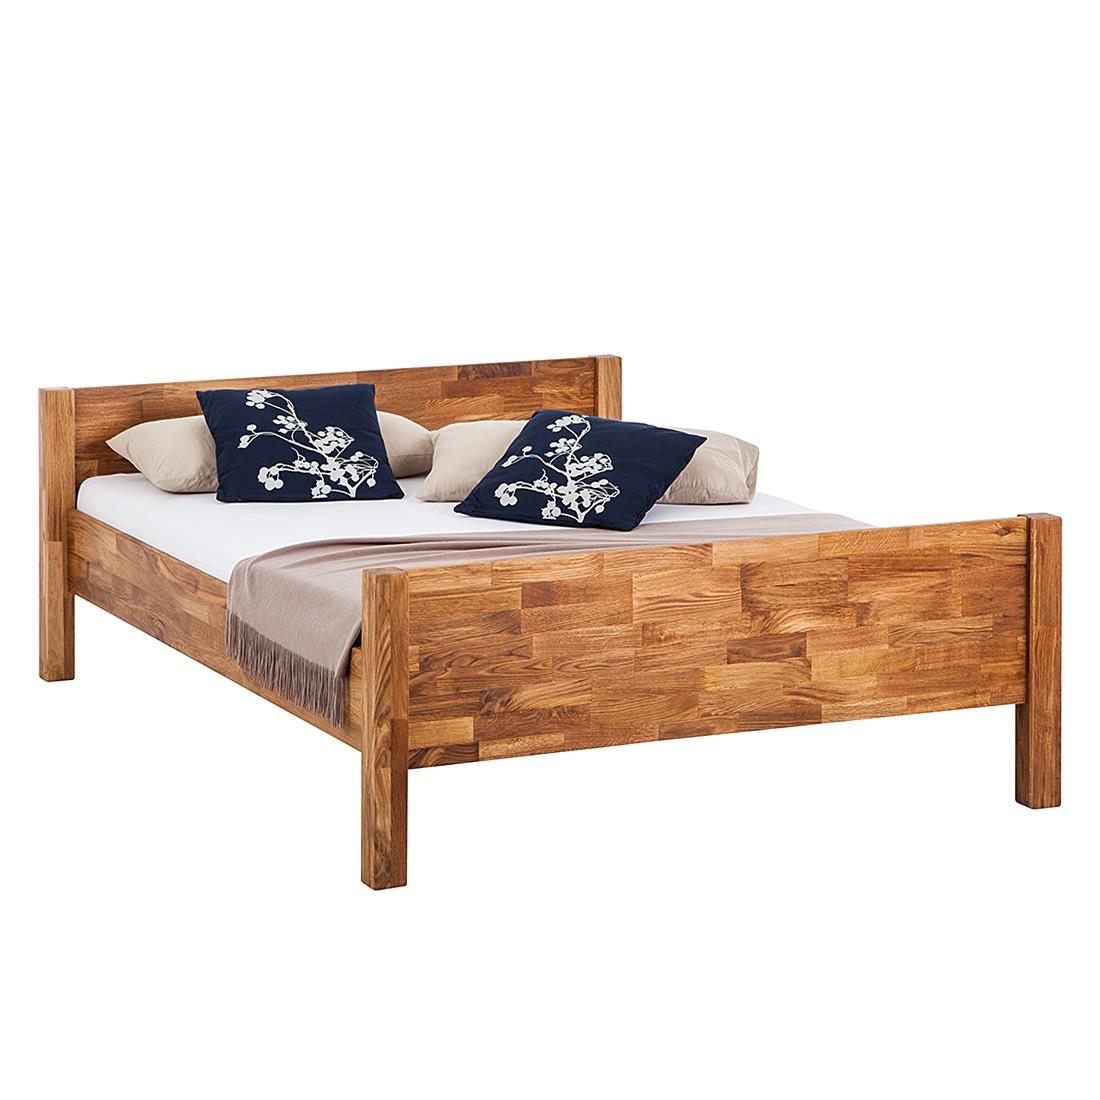 goedkoop Massief houten bed John 90 x 200cm Eik Ars Natura